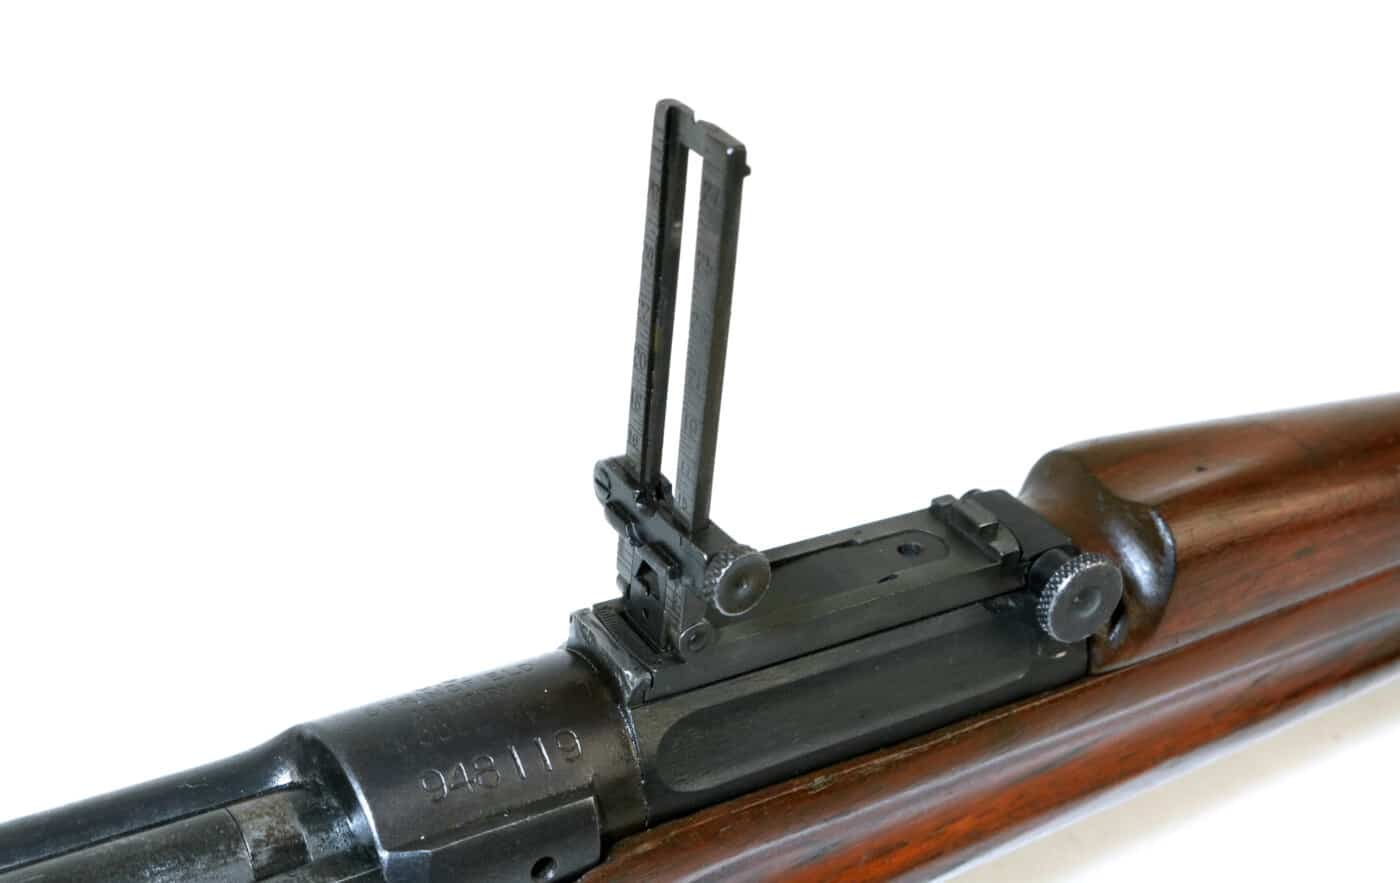 Rear sight of M1903 rifle